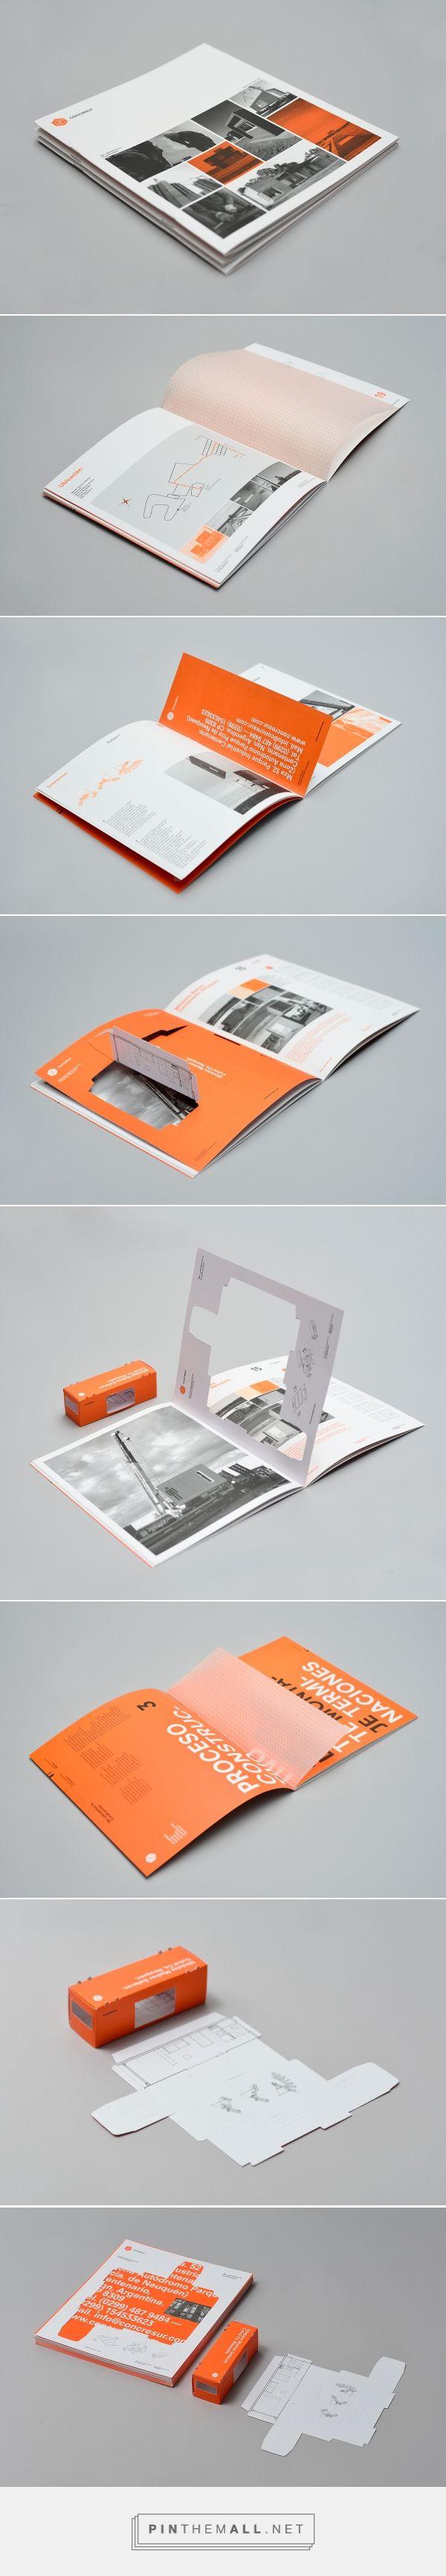 CONCRESUR Corporate Brochure by Hachetresele Studio